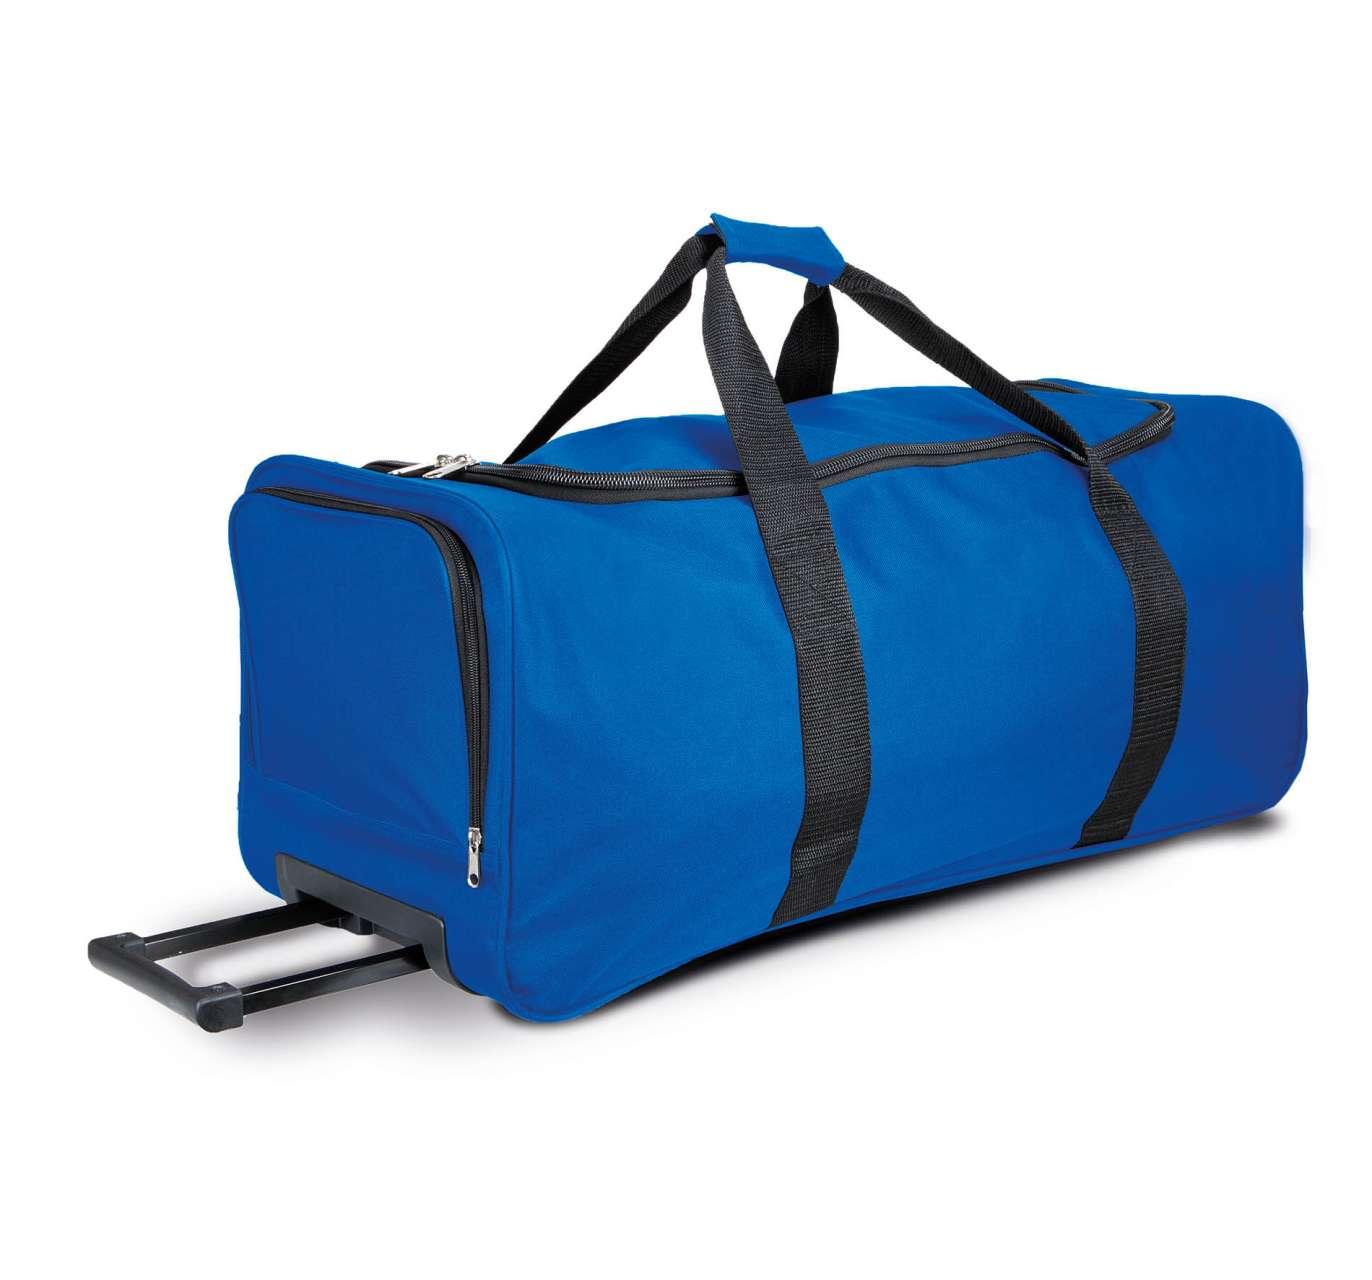 Geanta troller KI0812 albastru royal Genti rucsacuri personalizate conferinta laptop sport compartiment serigrafie broderie termotransfer